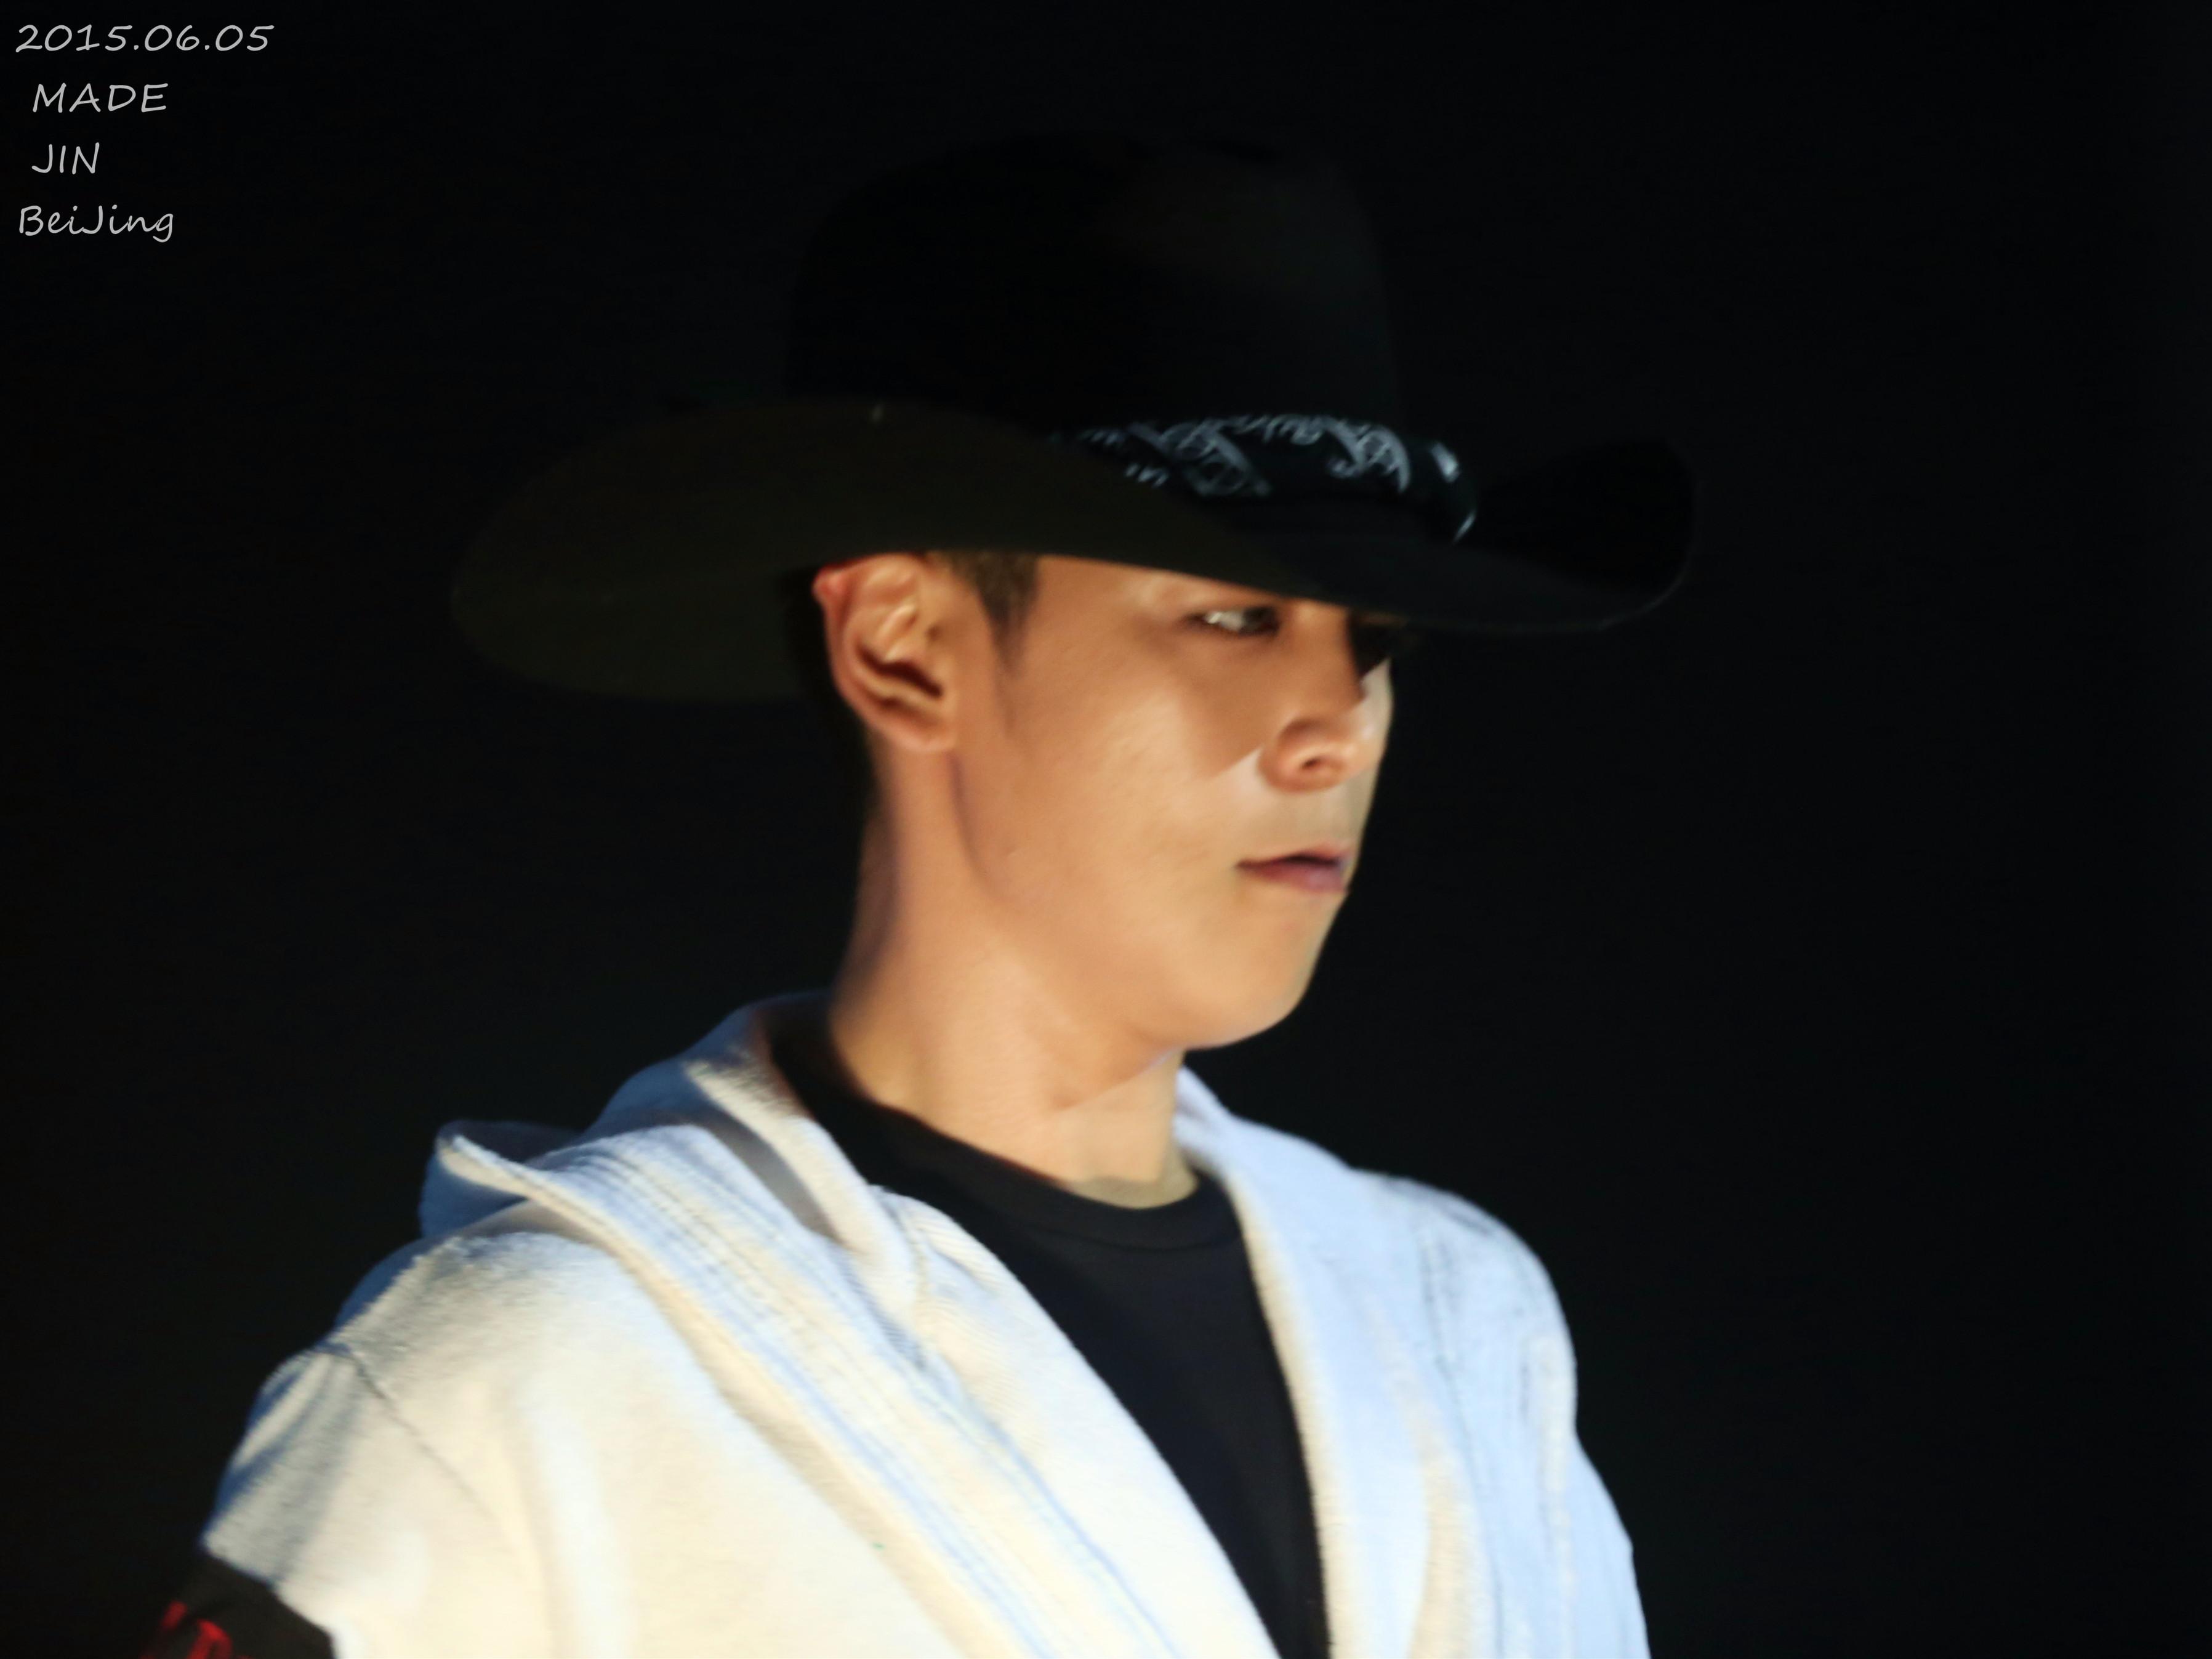 BIGBANG - Made Tour 2015 - Beijing - 05jun2015 - G-Jin - 07.jpg